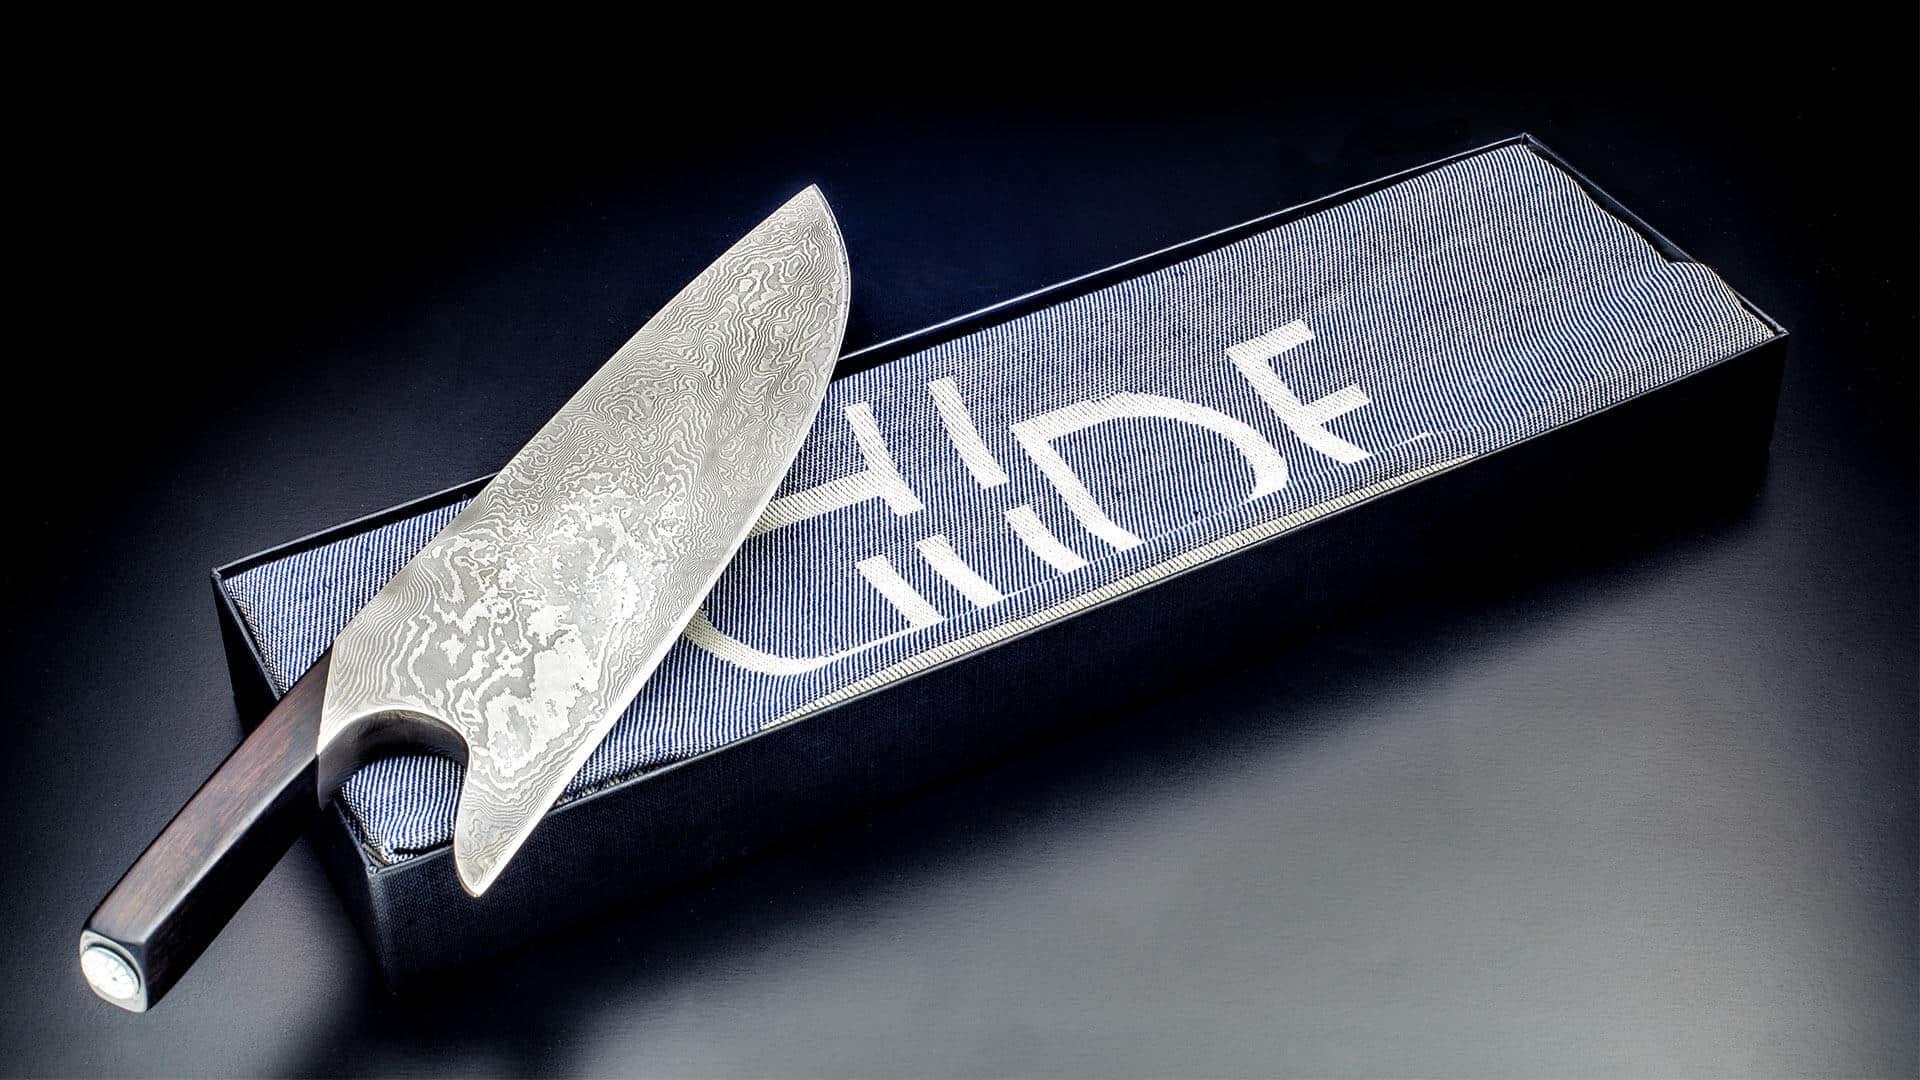 Güde Damastmesser The Knife Solingen